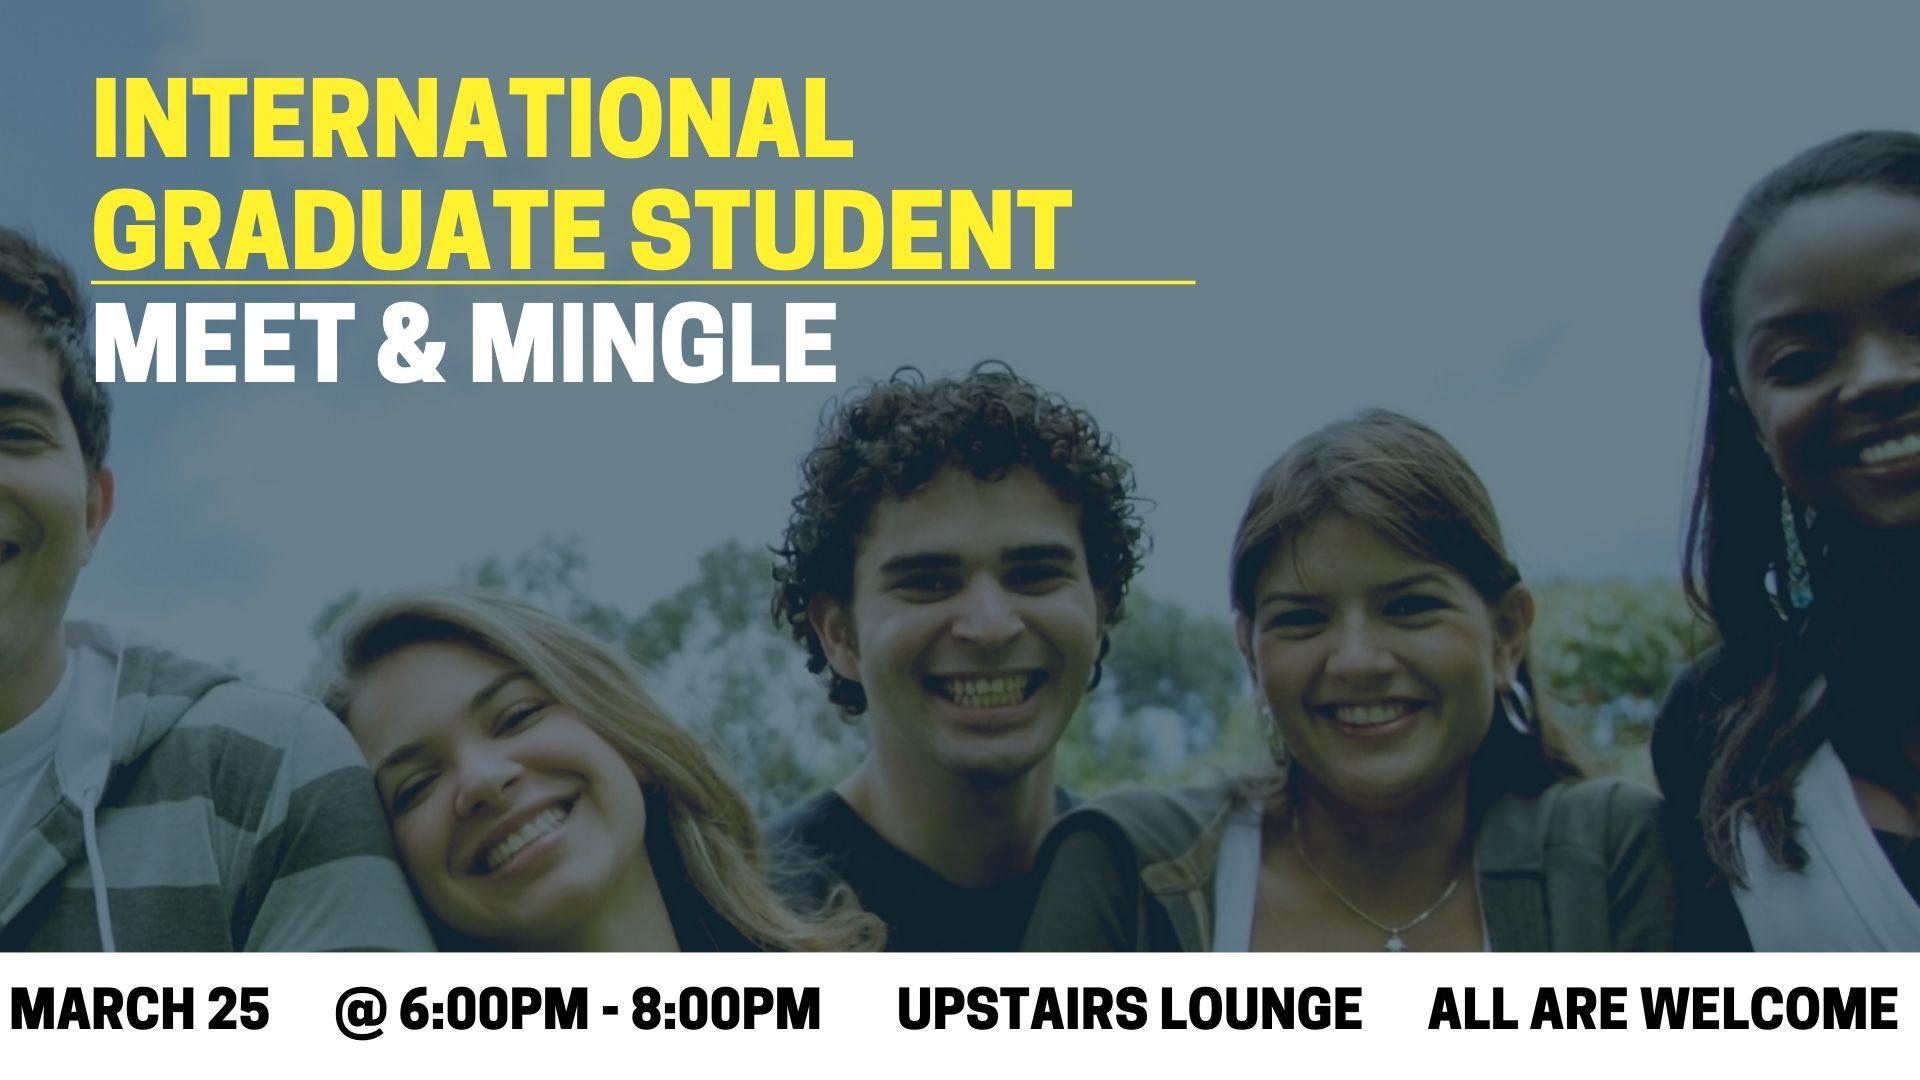 International Graduate Student Meet and Mingle Event